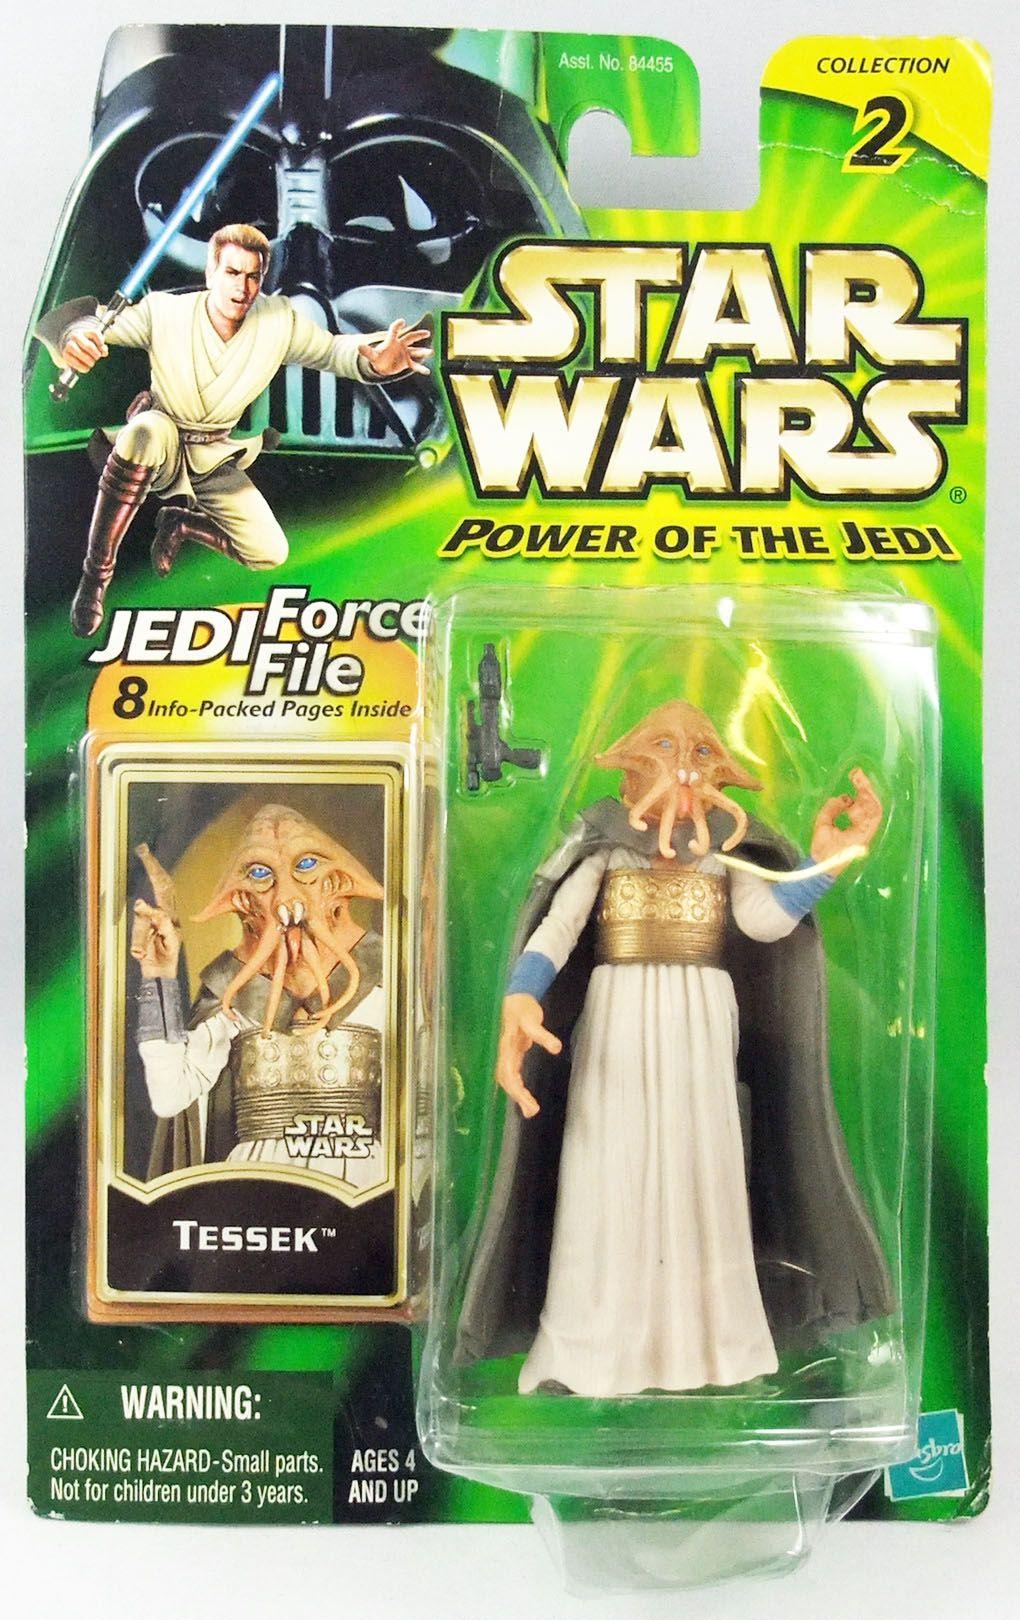 Star Wars (Power of the Jedi) - Hasbro - Tessek